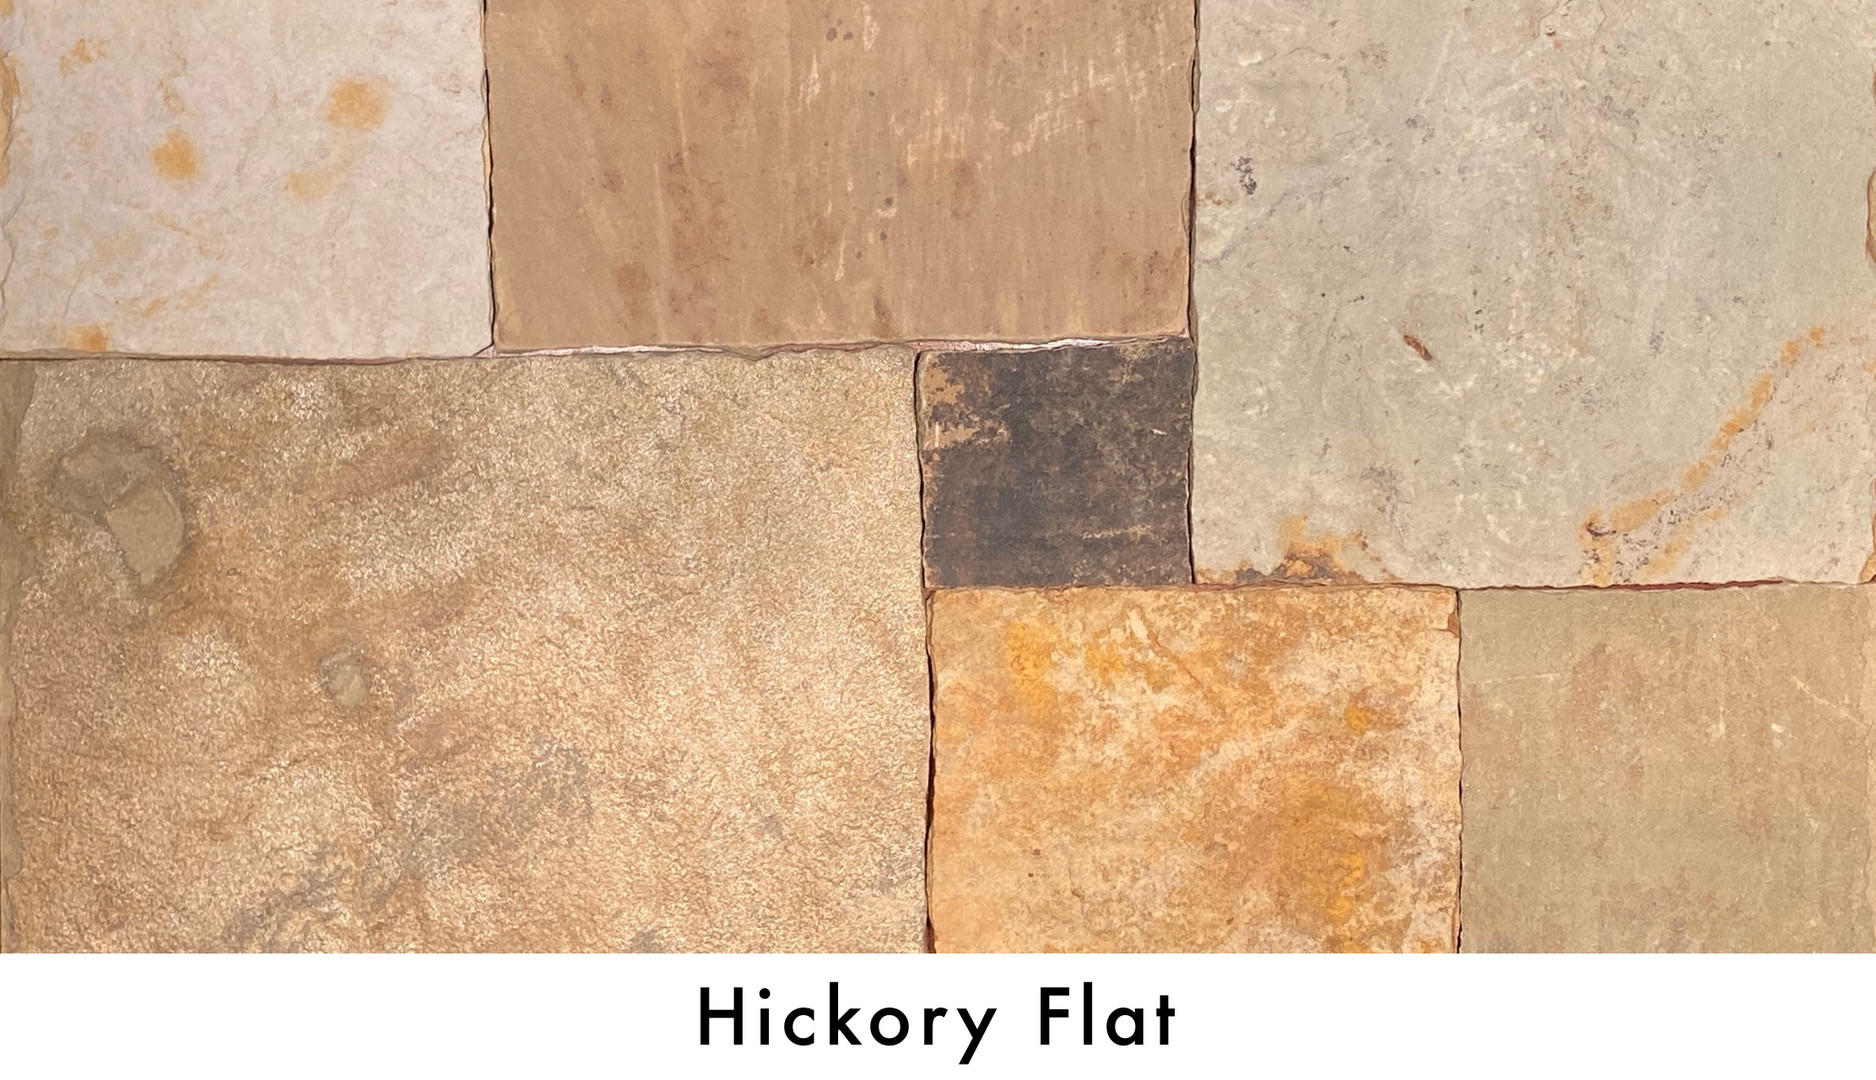 Hickory Flat